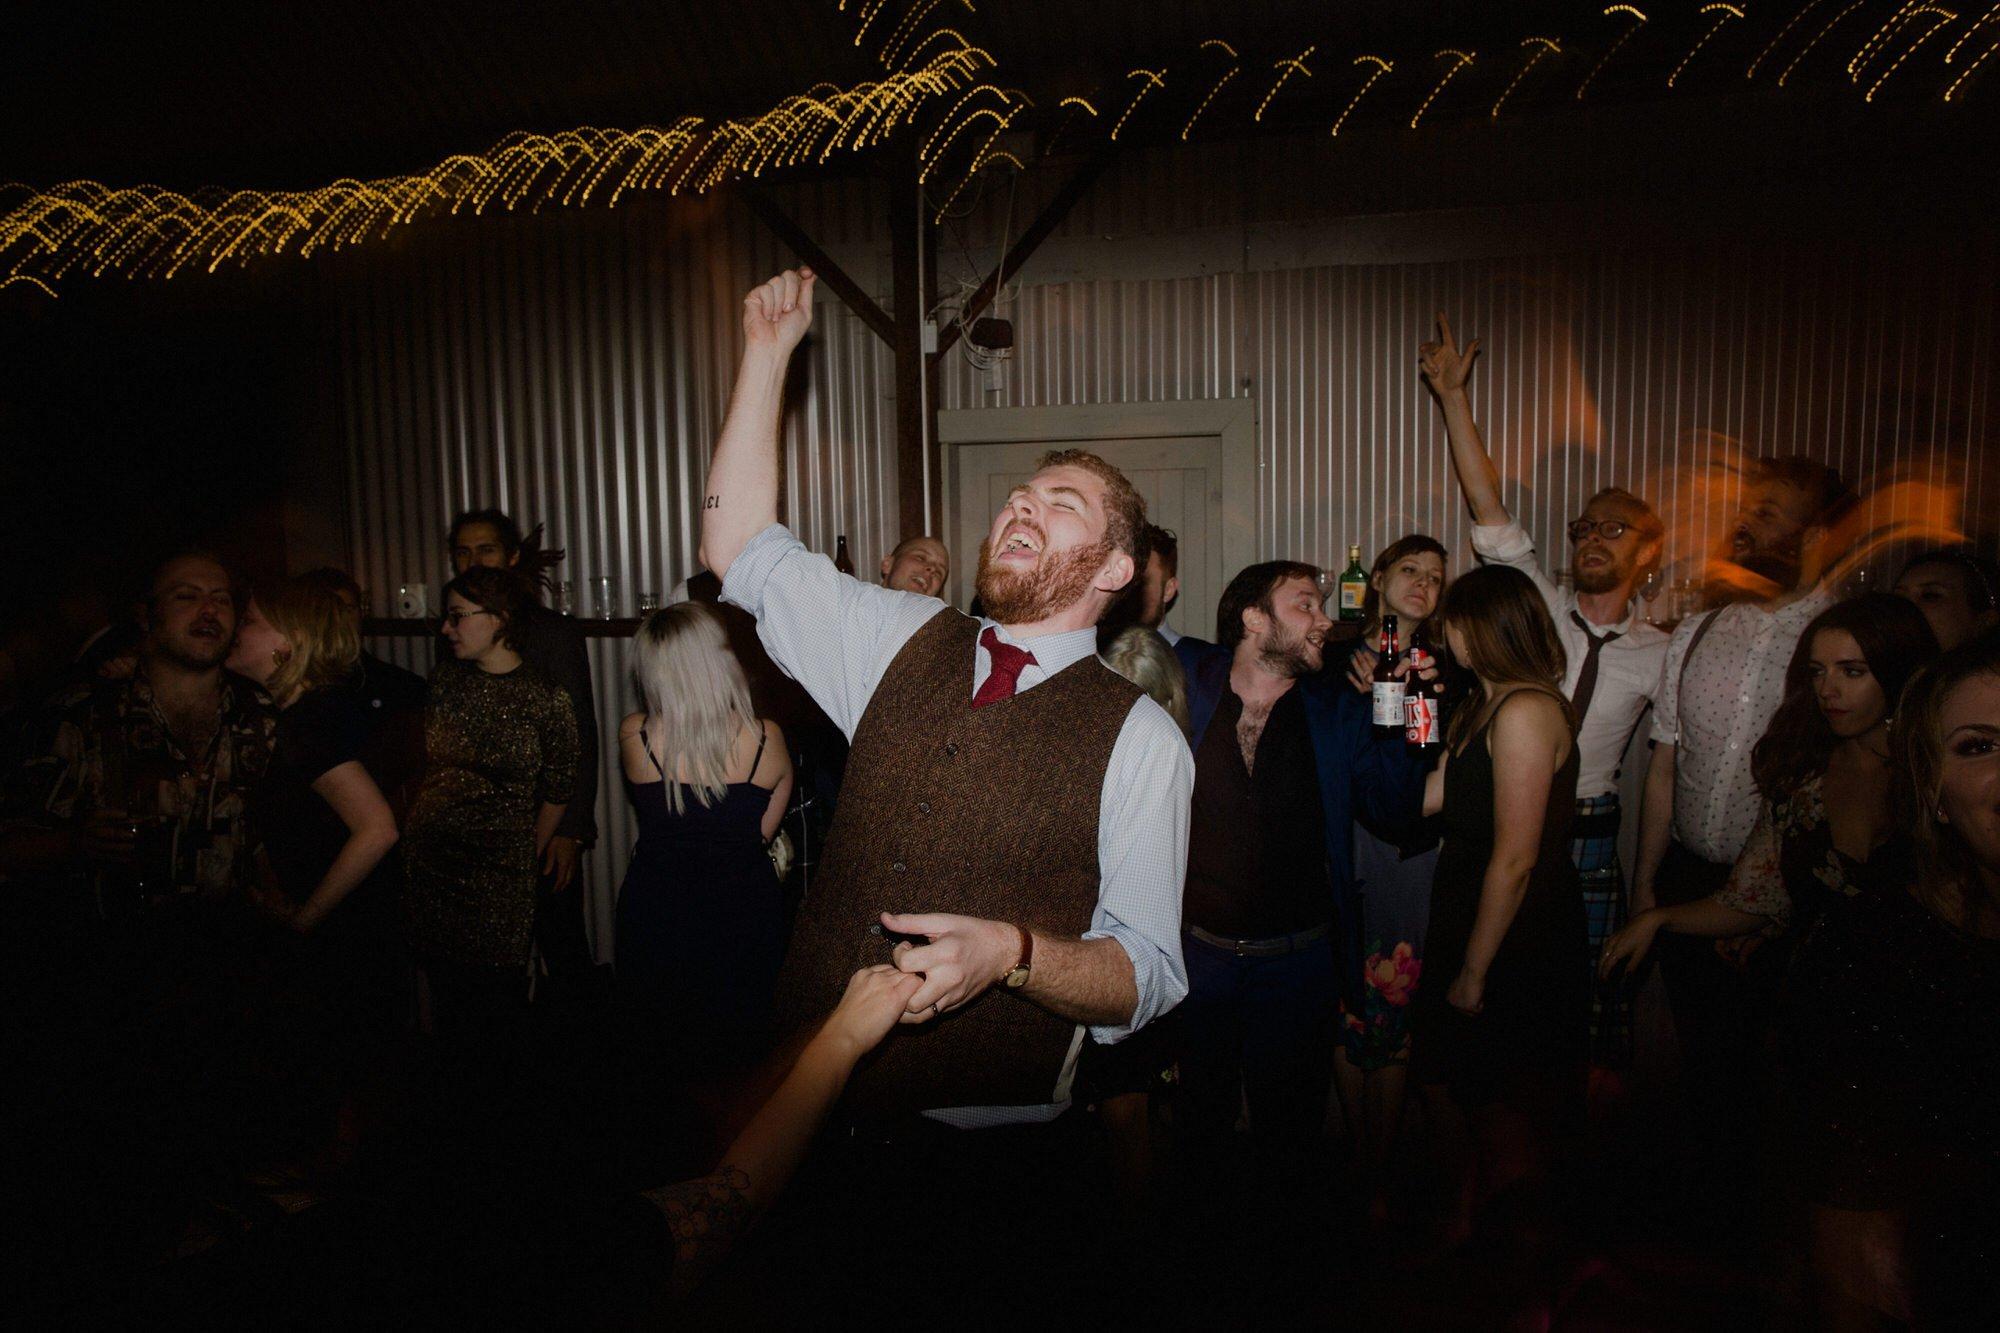 086 TIN SHED KNOCKRAICH FARM WEDDING NIGHT PARTY DANCING ALTERNATIVE BRIDE ZOE ALEXANDRA PHOTOGRAPHY